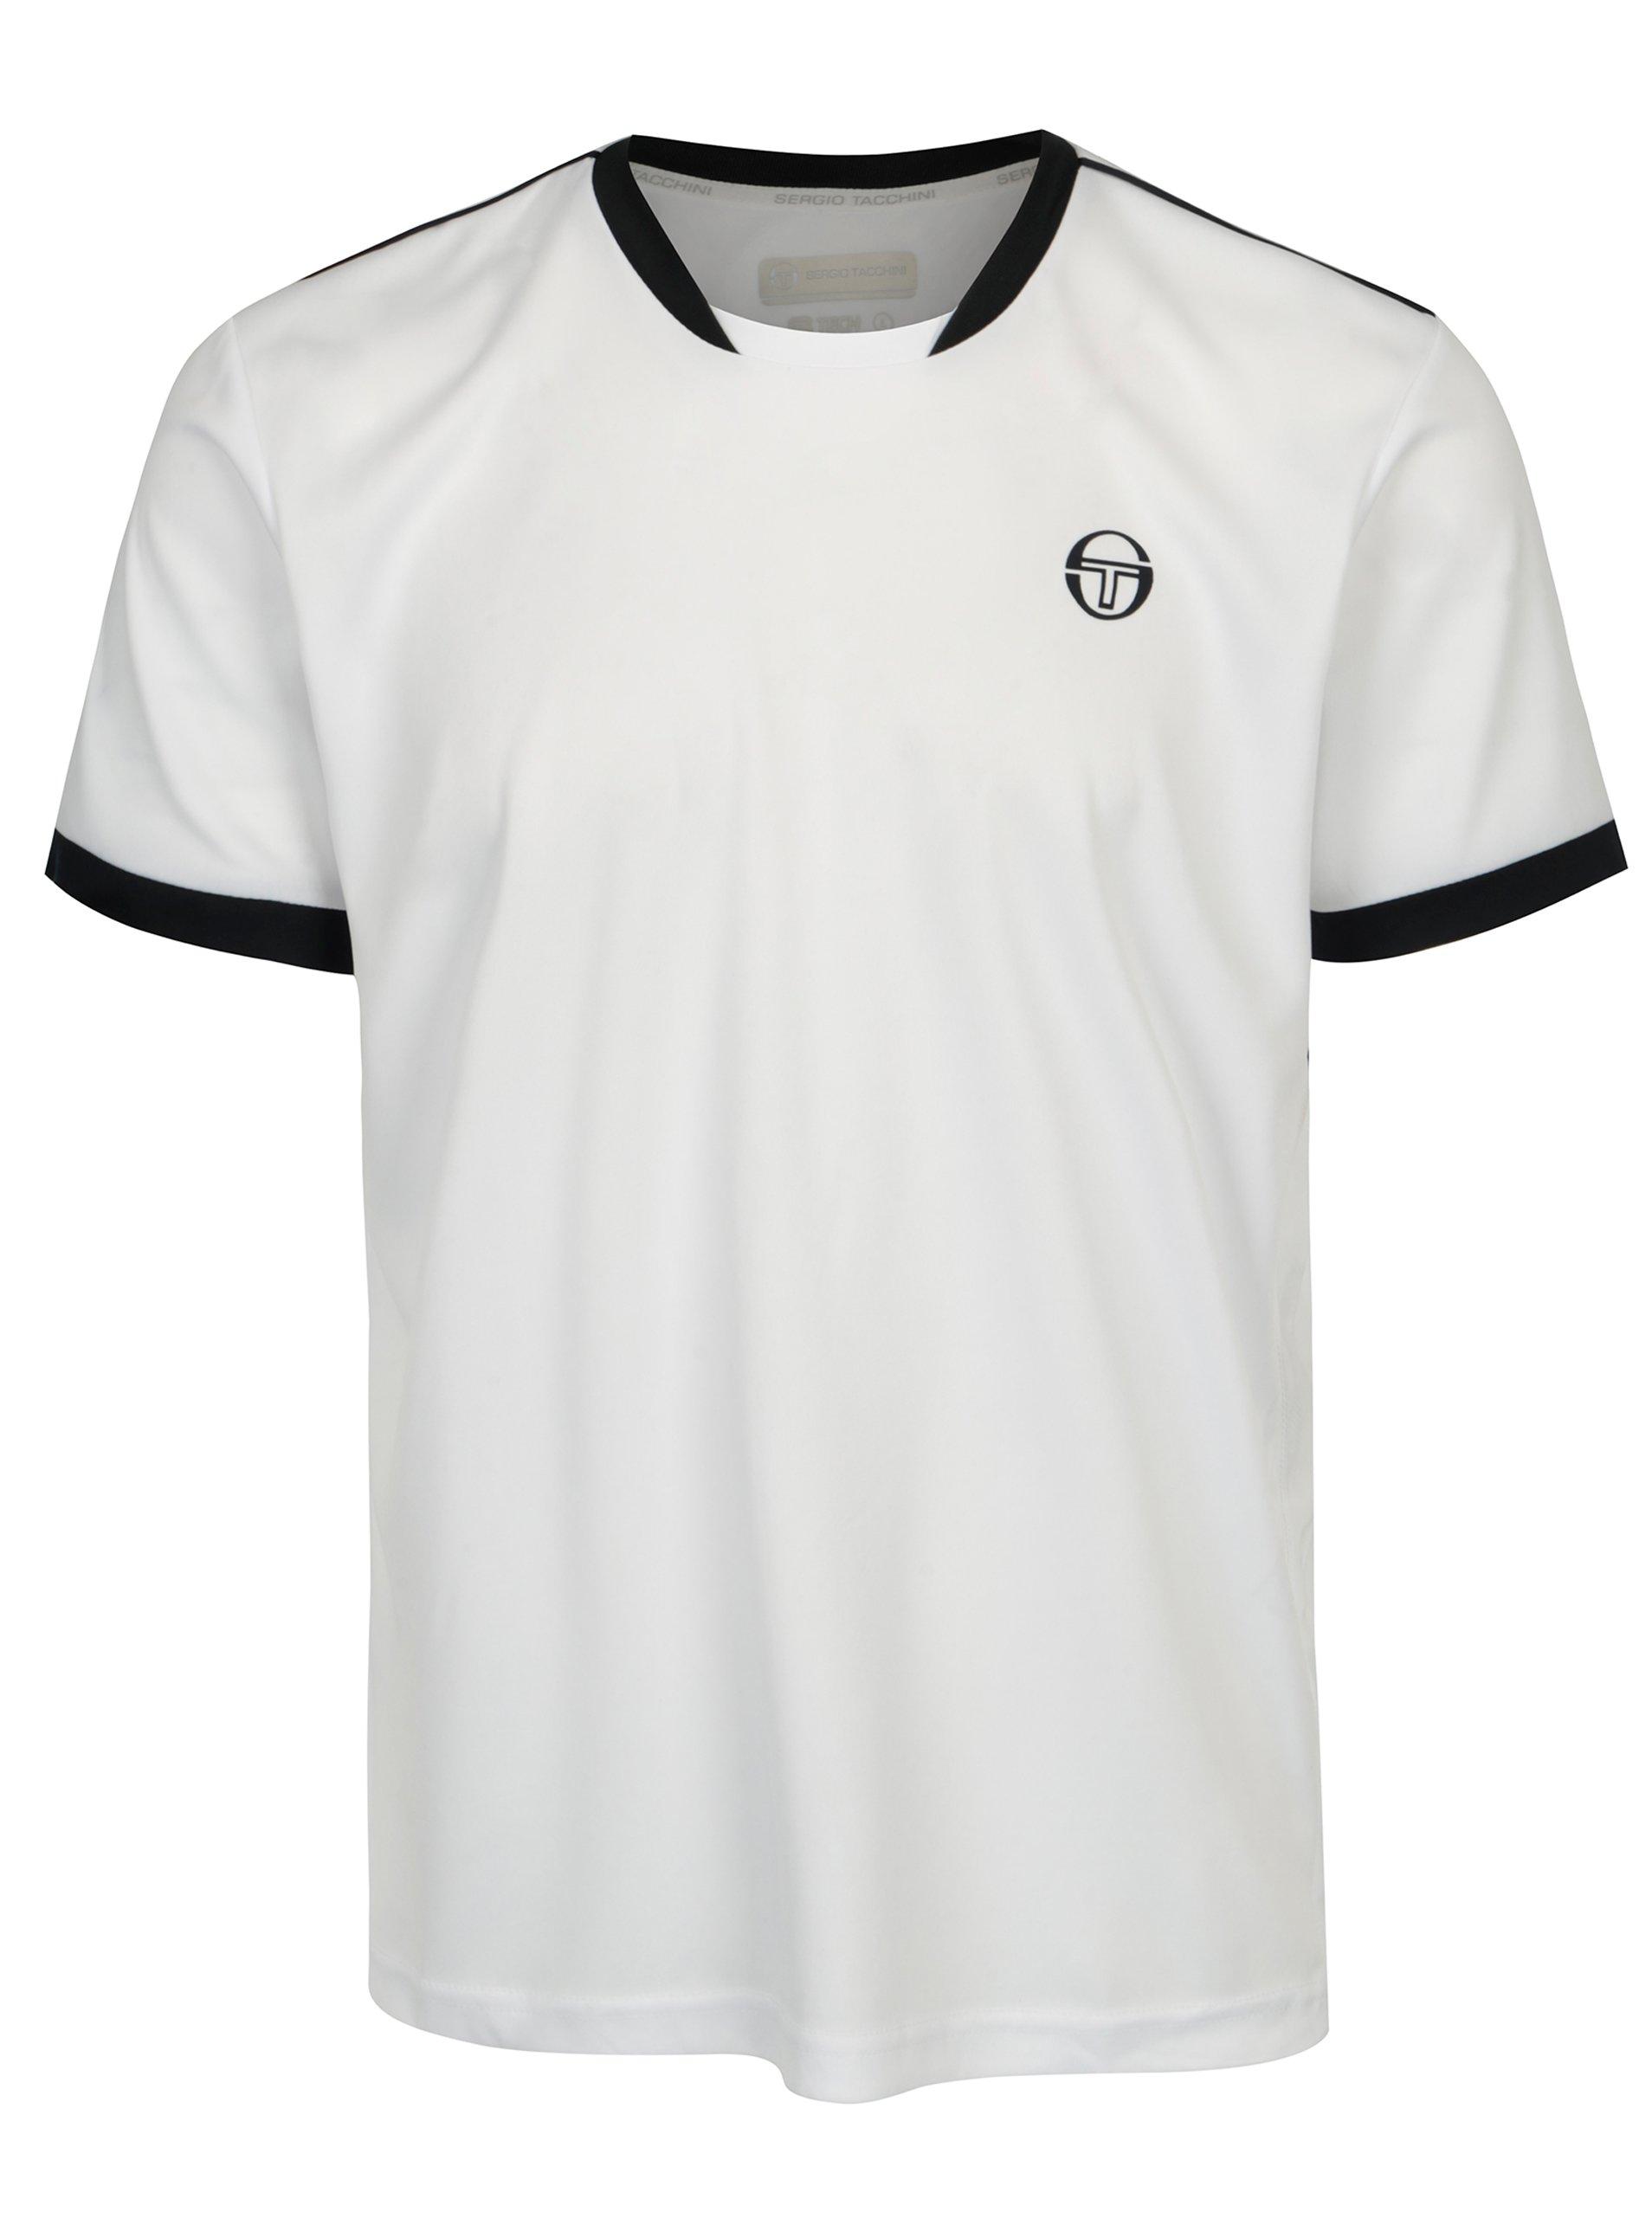 Bílé pánské sportovní tričko Sergio Tacchini Club Tech